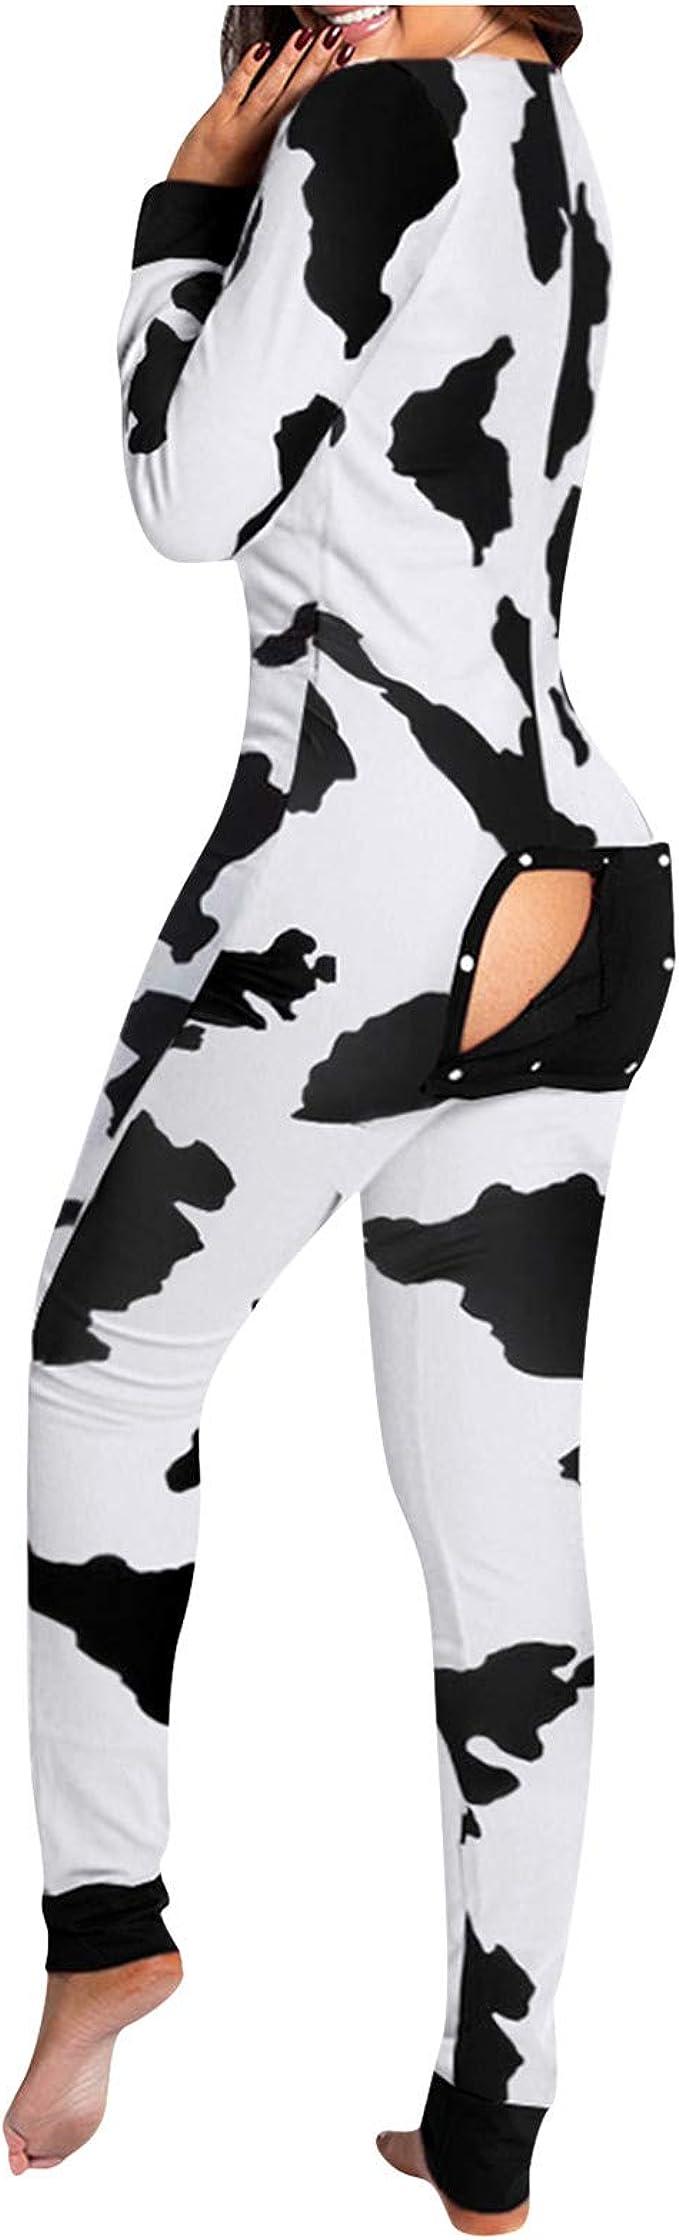 AODONG Pajamas for Women,Womens Pajamas Deep V Jumpsuit Bodycon Onesie Rompers Sleepwear